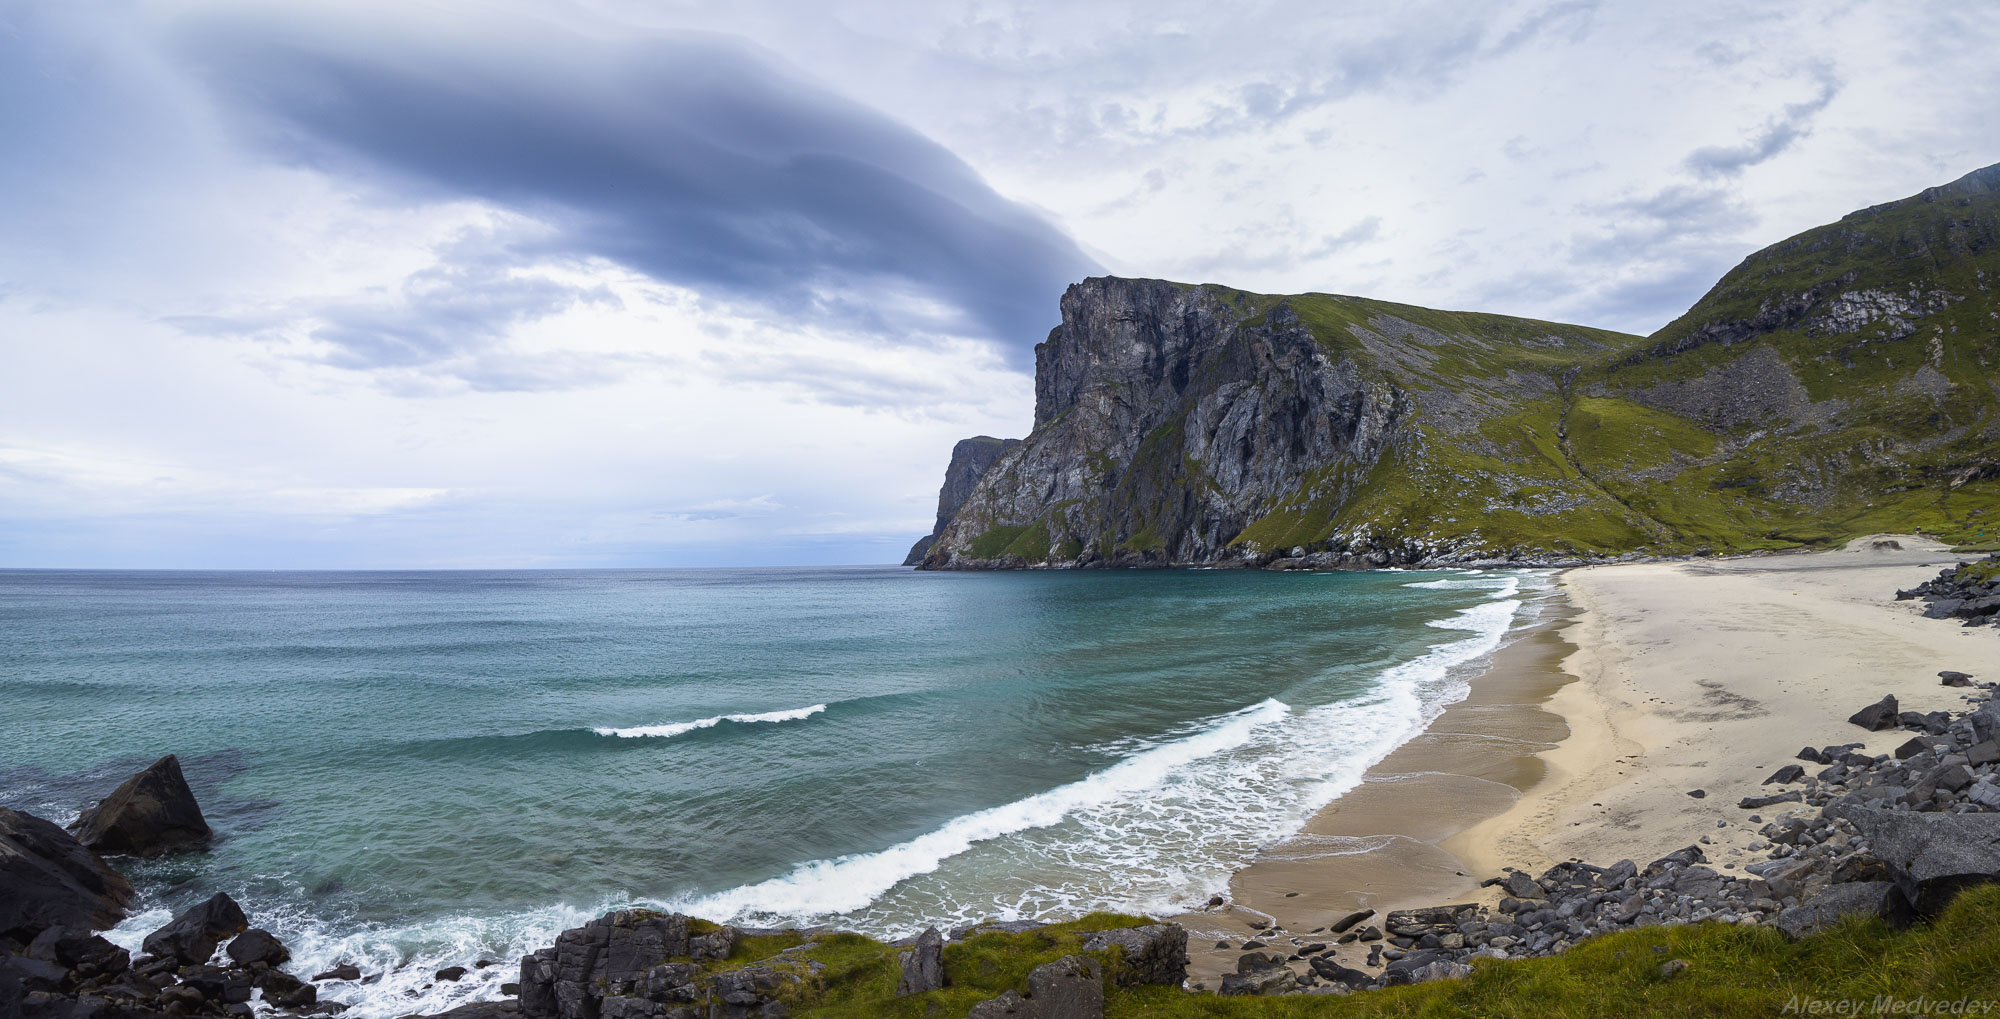 lofoten, norway, sea, beach, Алексей Медведев